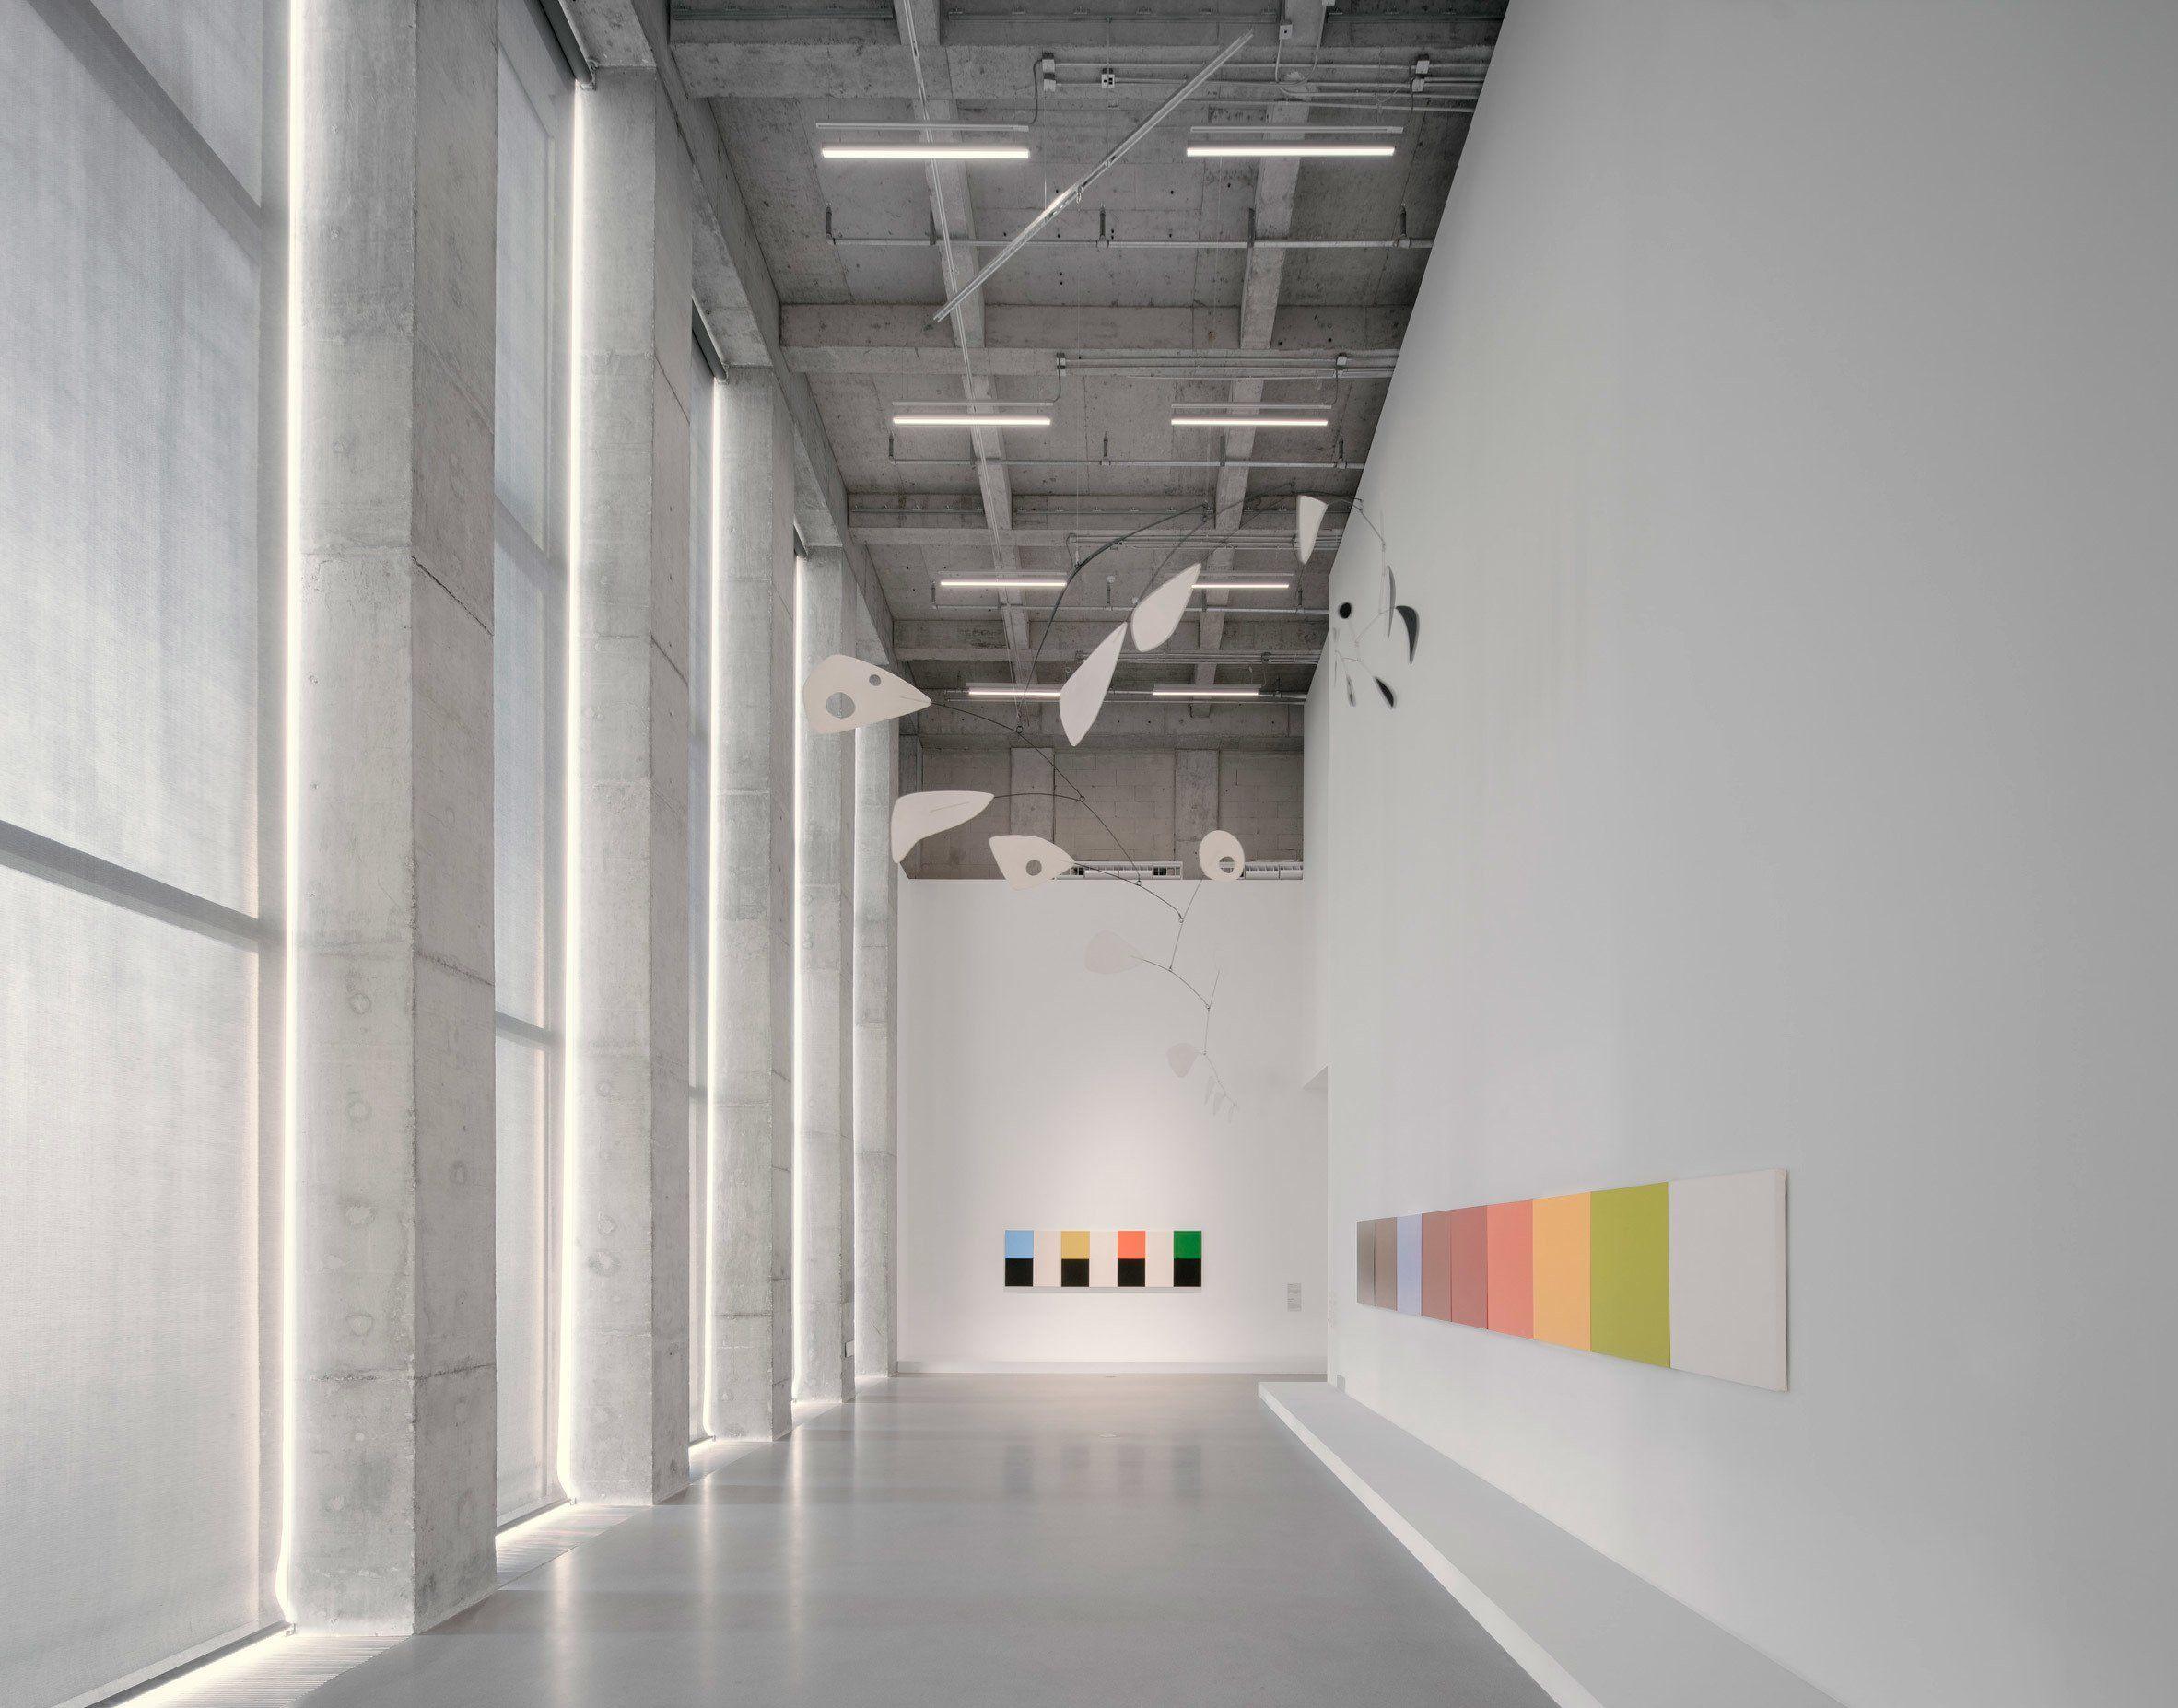 David Chipperfield Architects Open Elegant West Bund Museum In Shanghai Ignant In 2020 David Chipperfield Architects Architect Museum